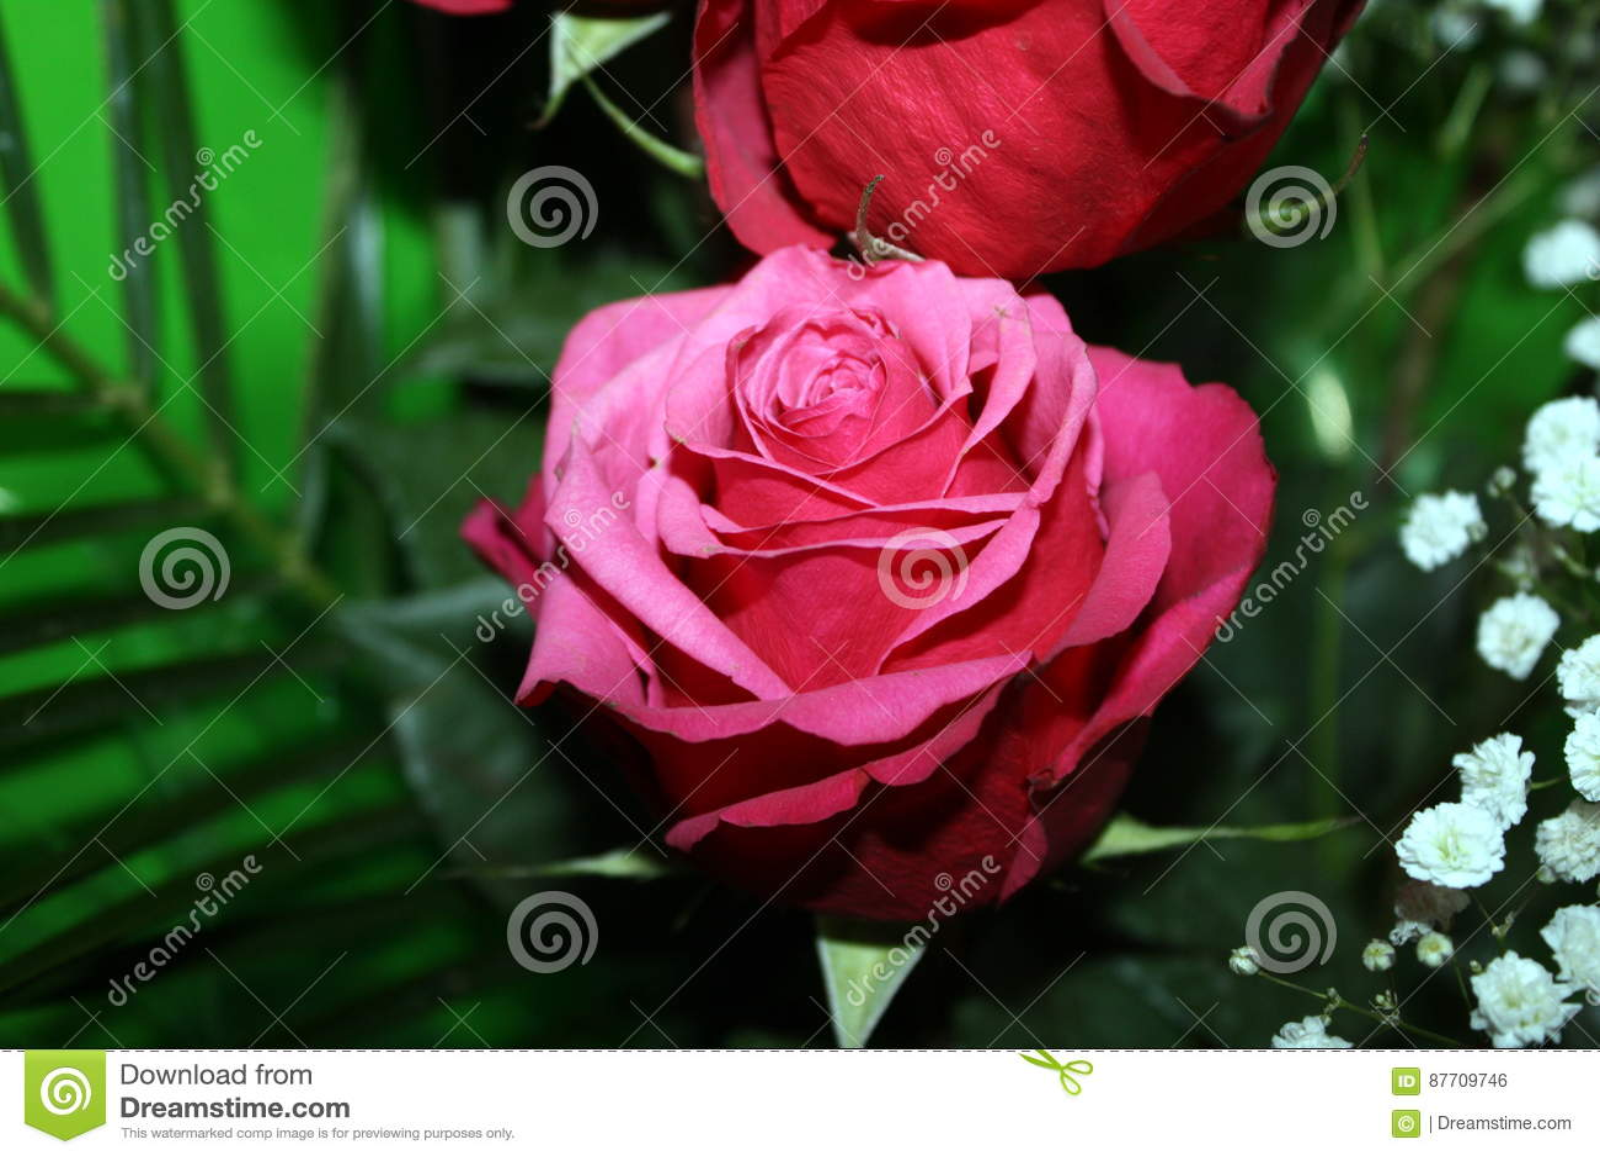 Feuilles merveilleuses de rose et de vert de rose